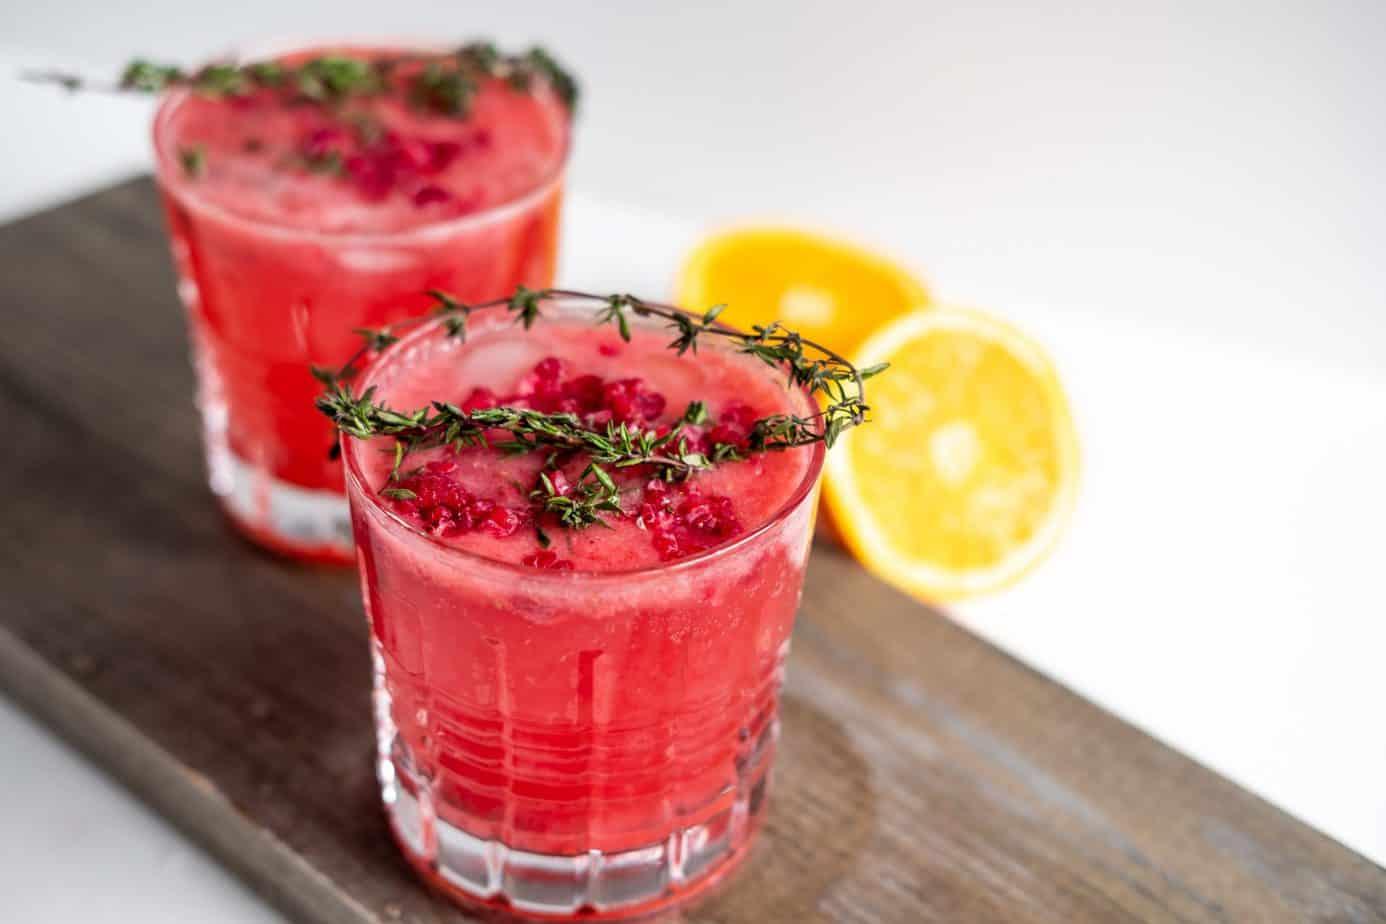 best masticating juicers under $200